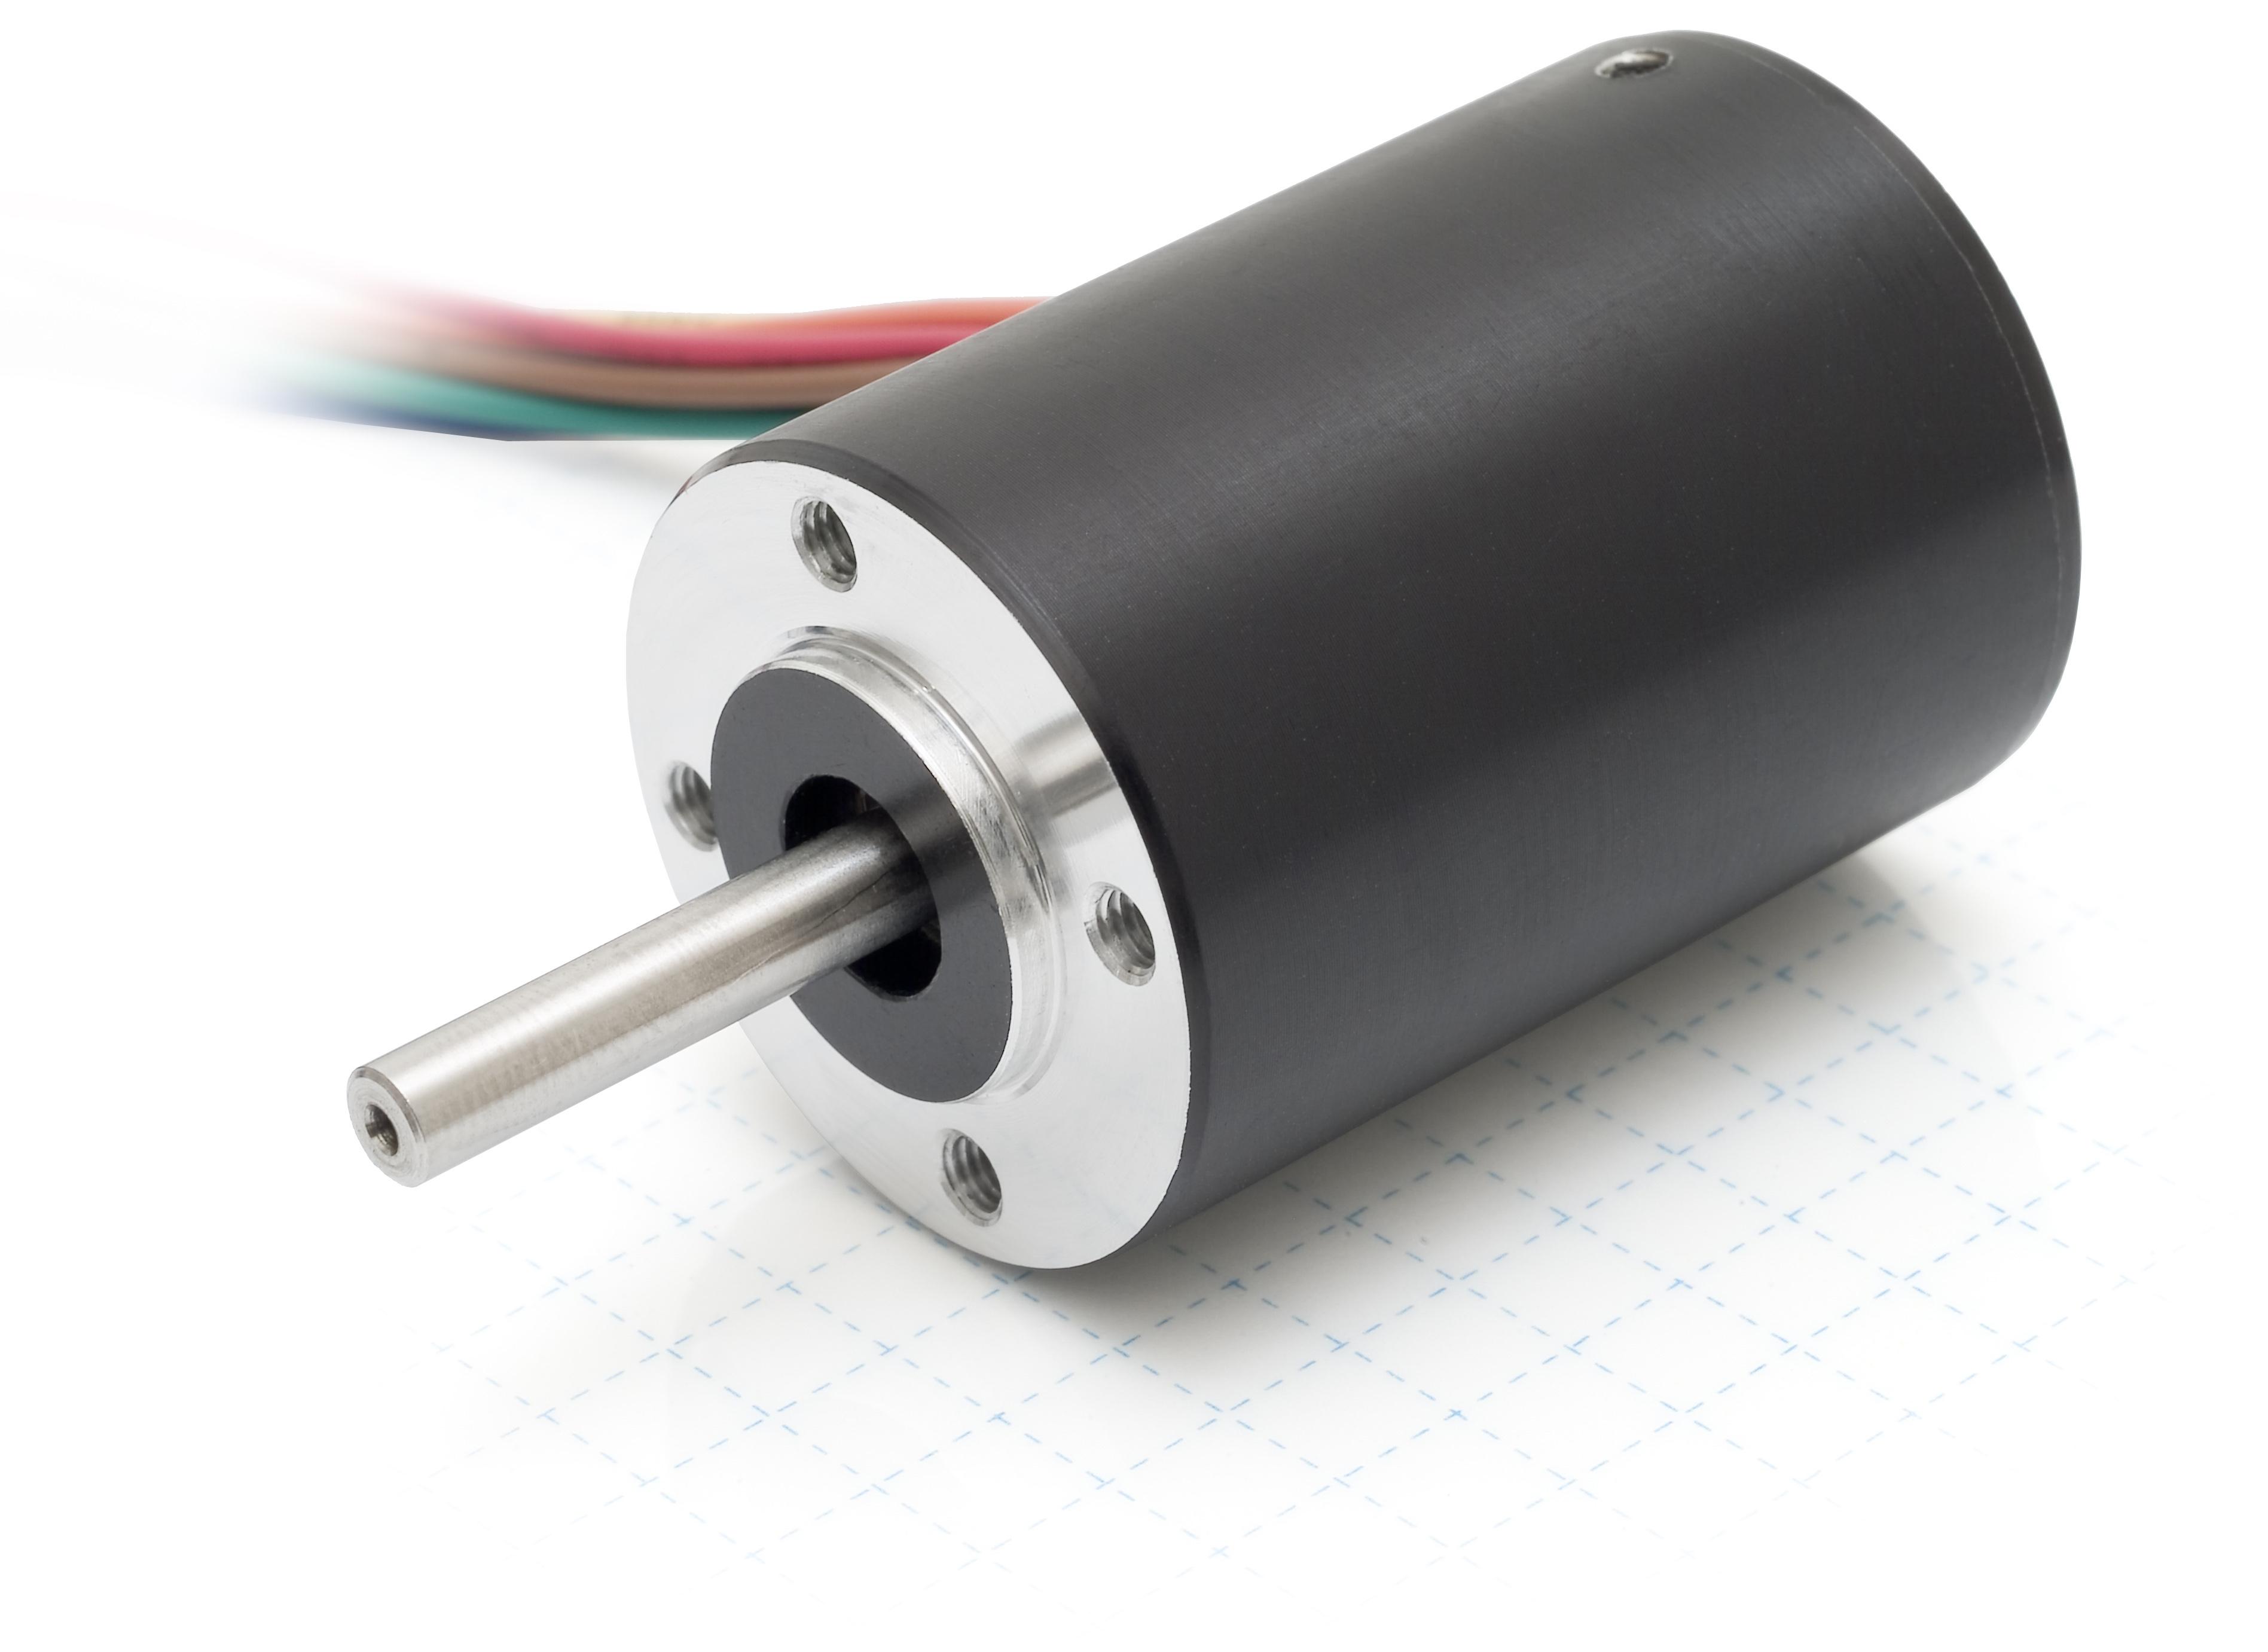 Nanotec Db28 Brushless Ec Servo Motor